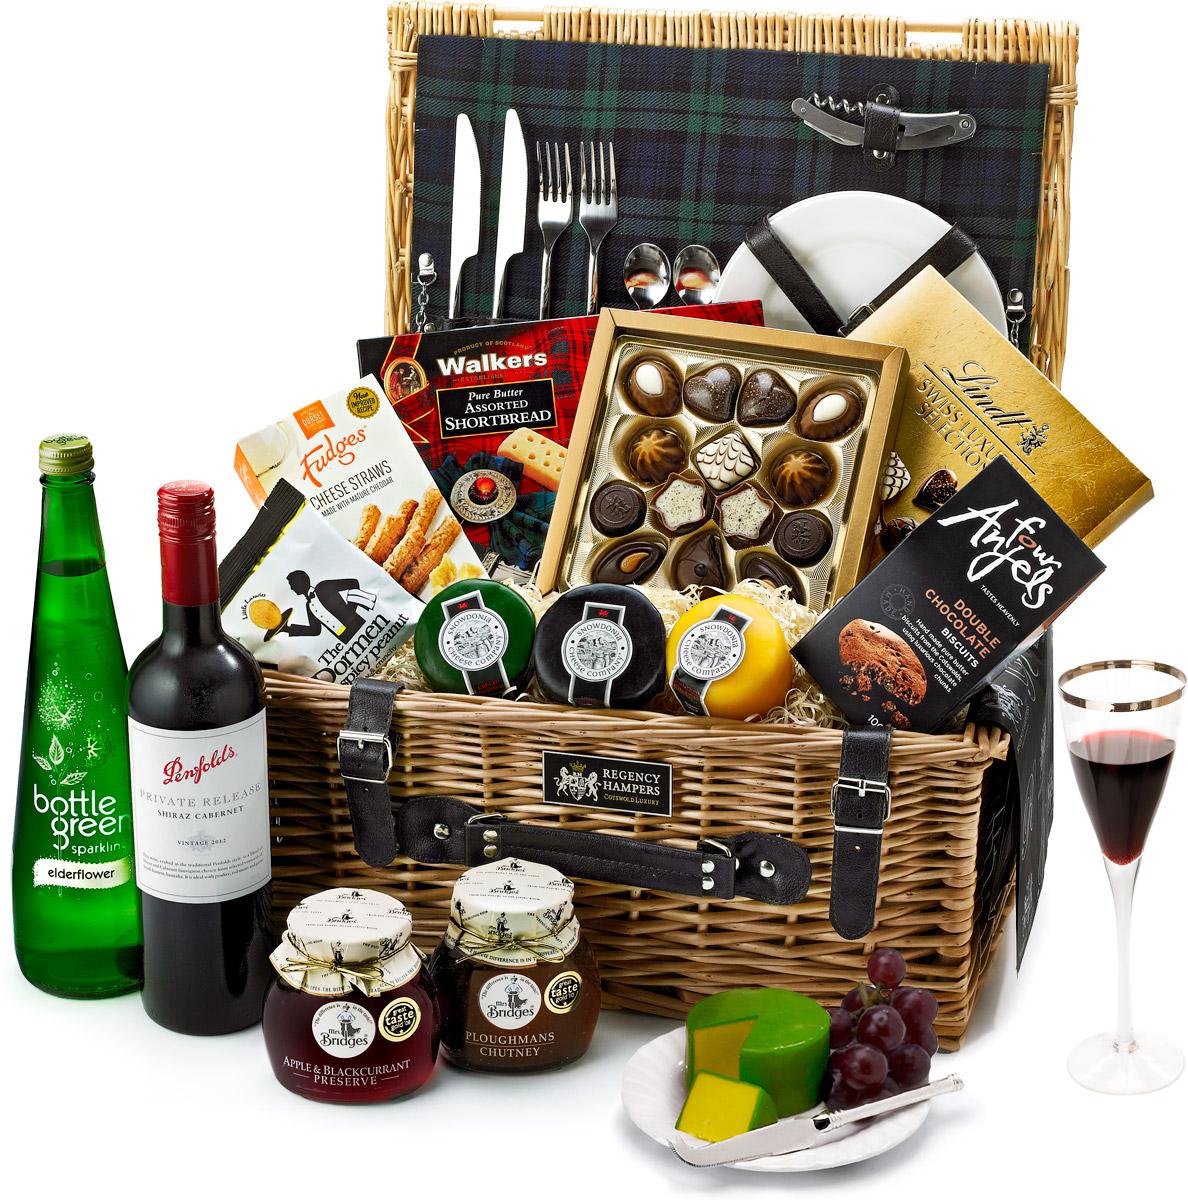 WIN a picnic gift hamper